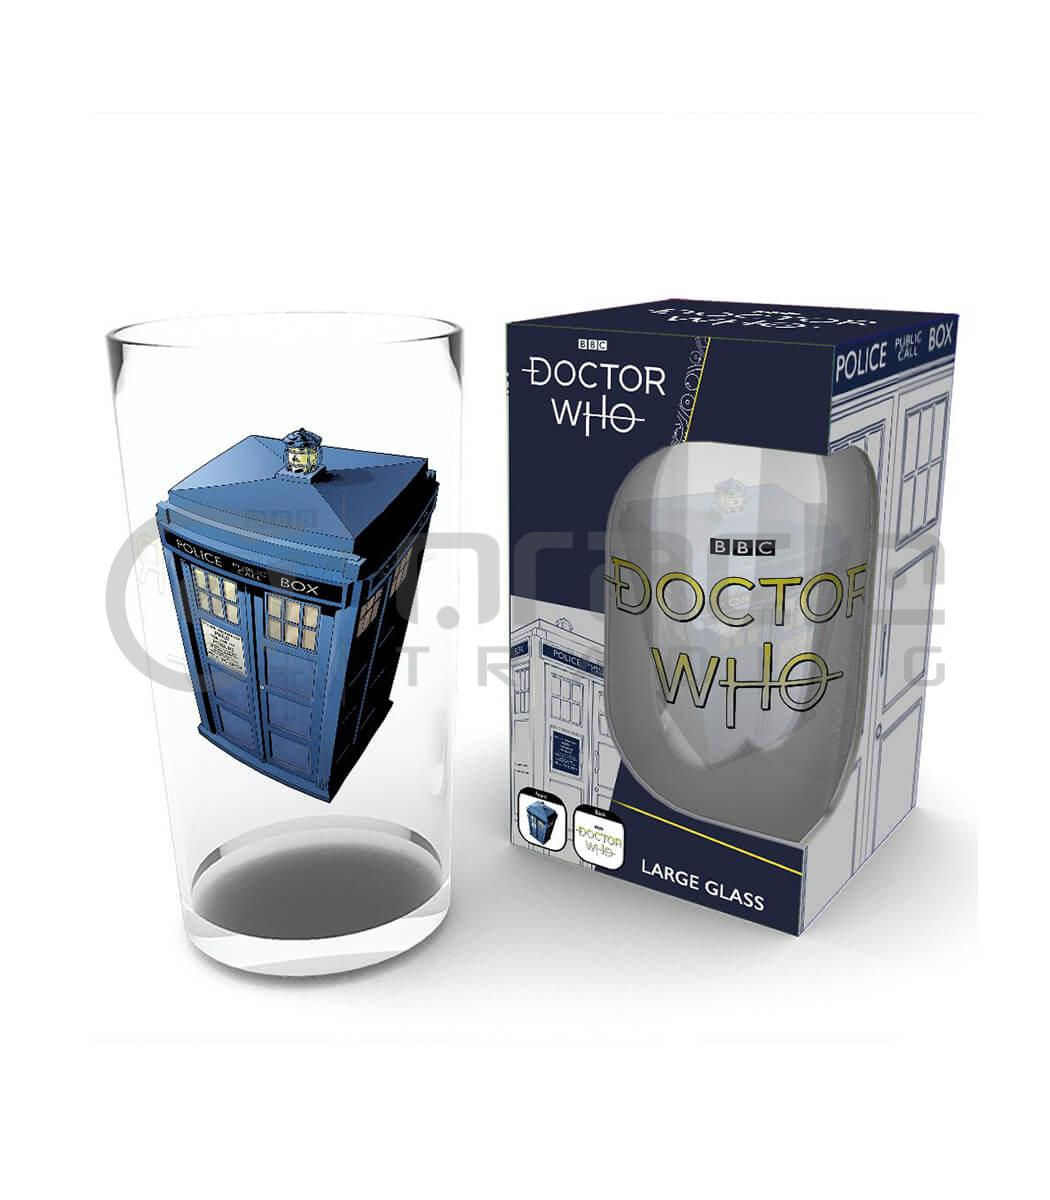 Doctor Who Large Glass - Tardis